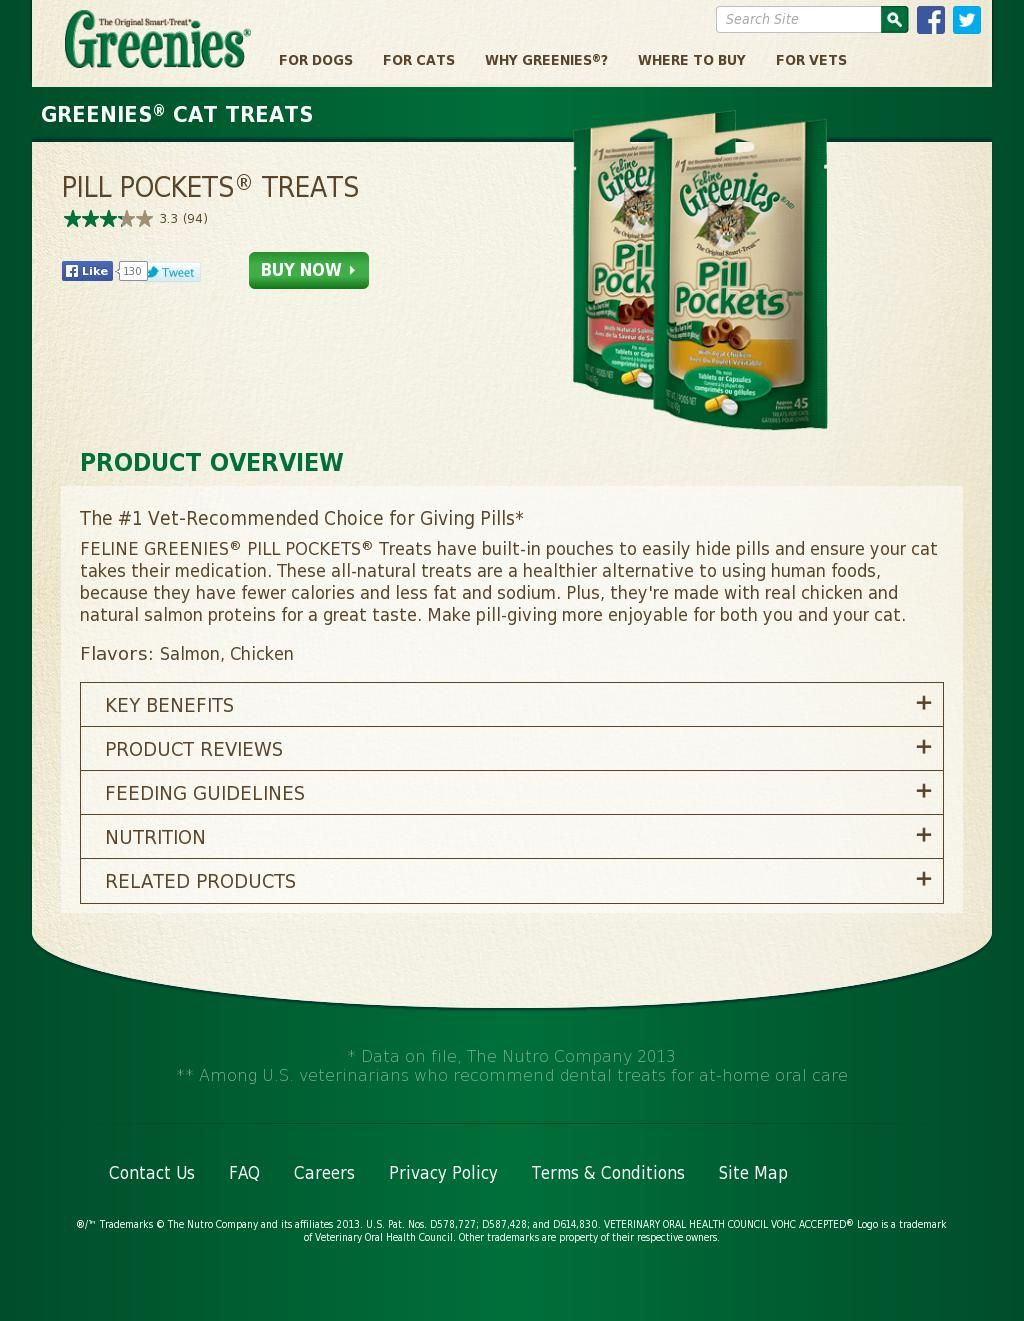 Greenies Feline Pill Pockets Chicken Flavor available in